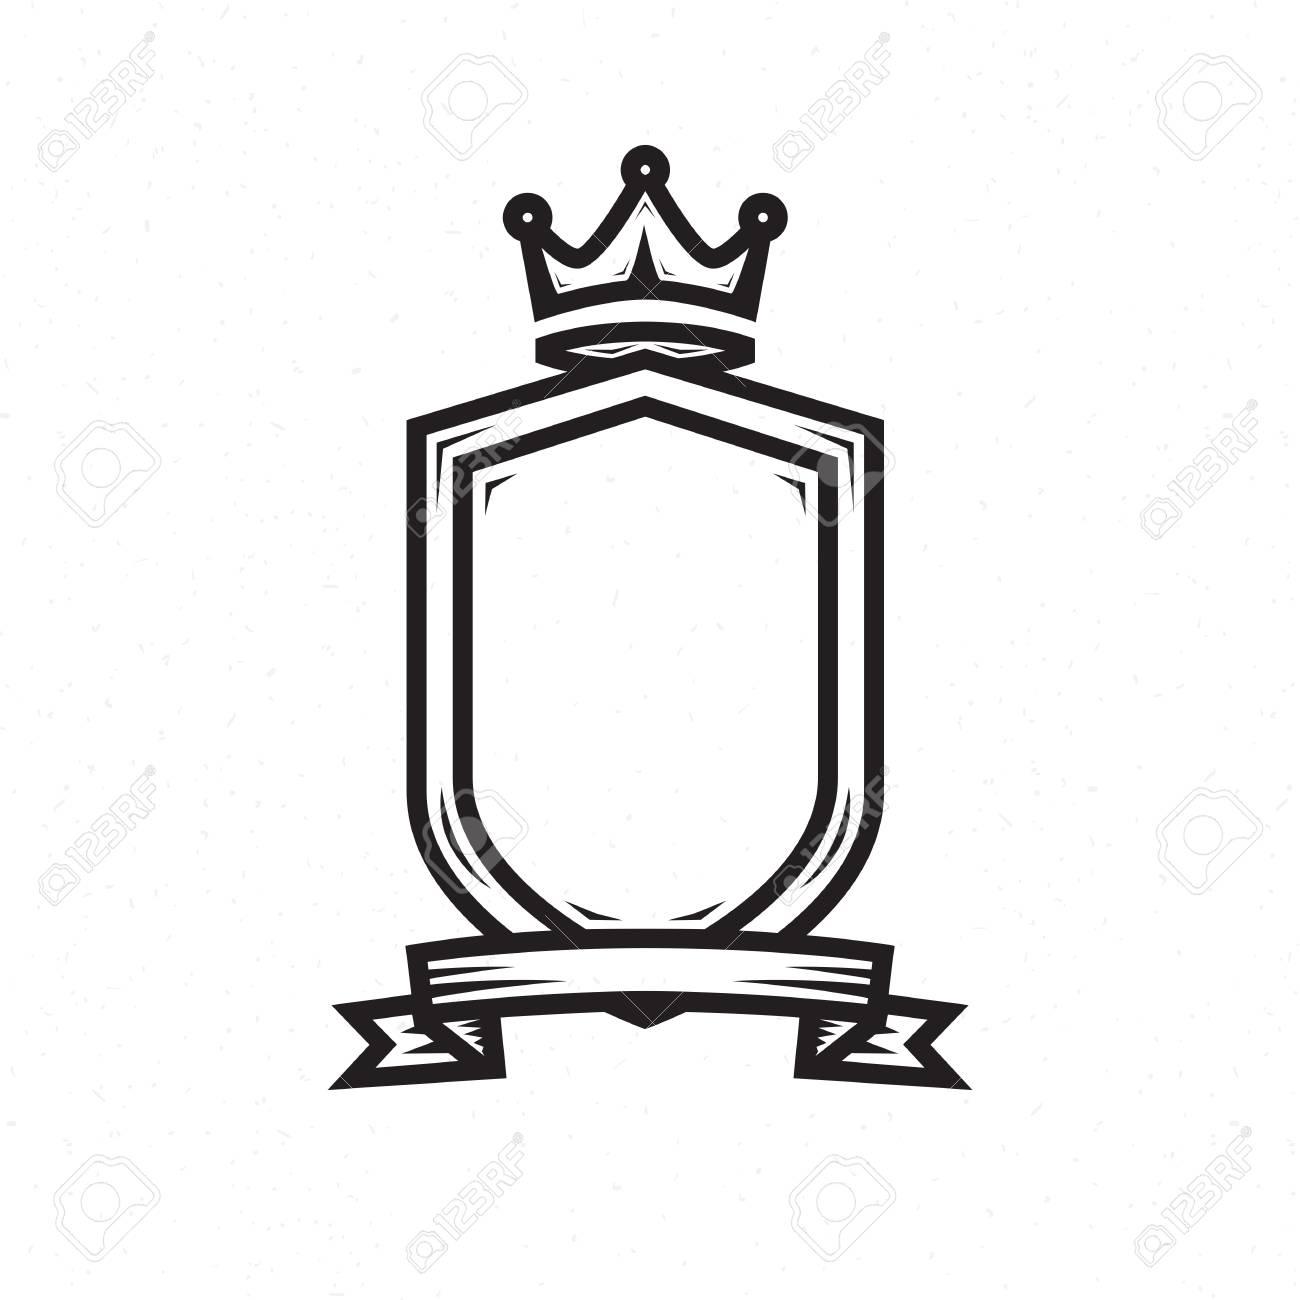 Shield Template For The Heraldic Logo Stock Vector